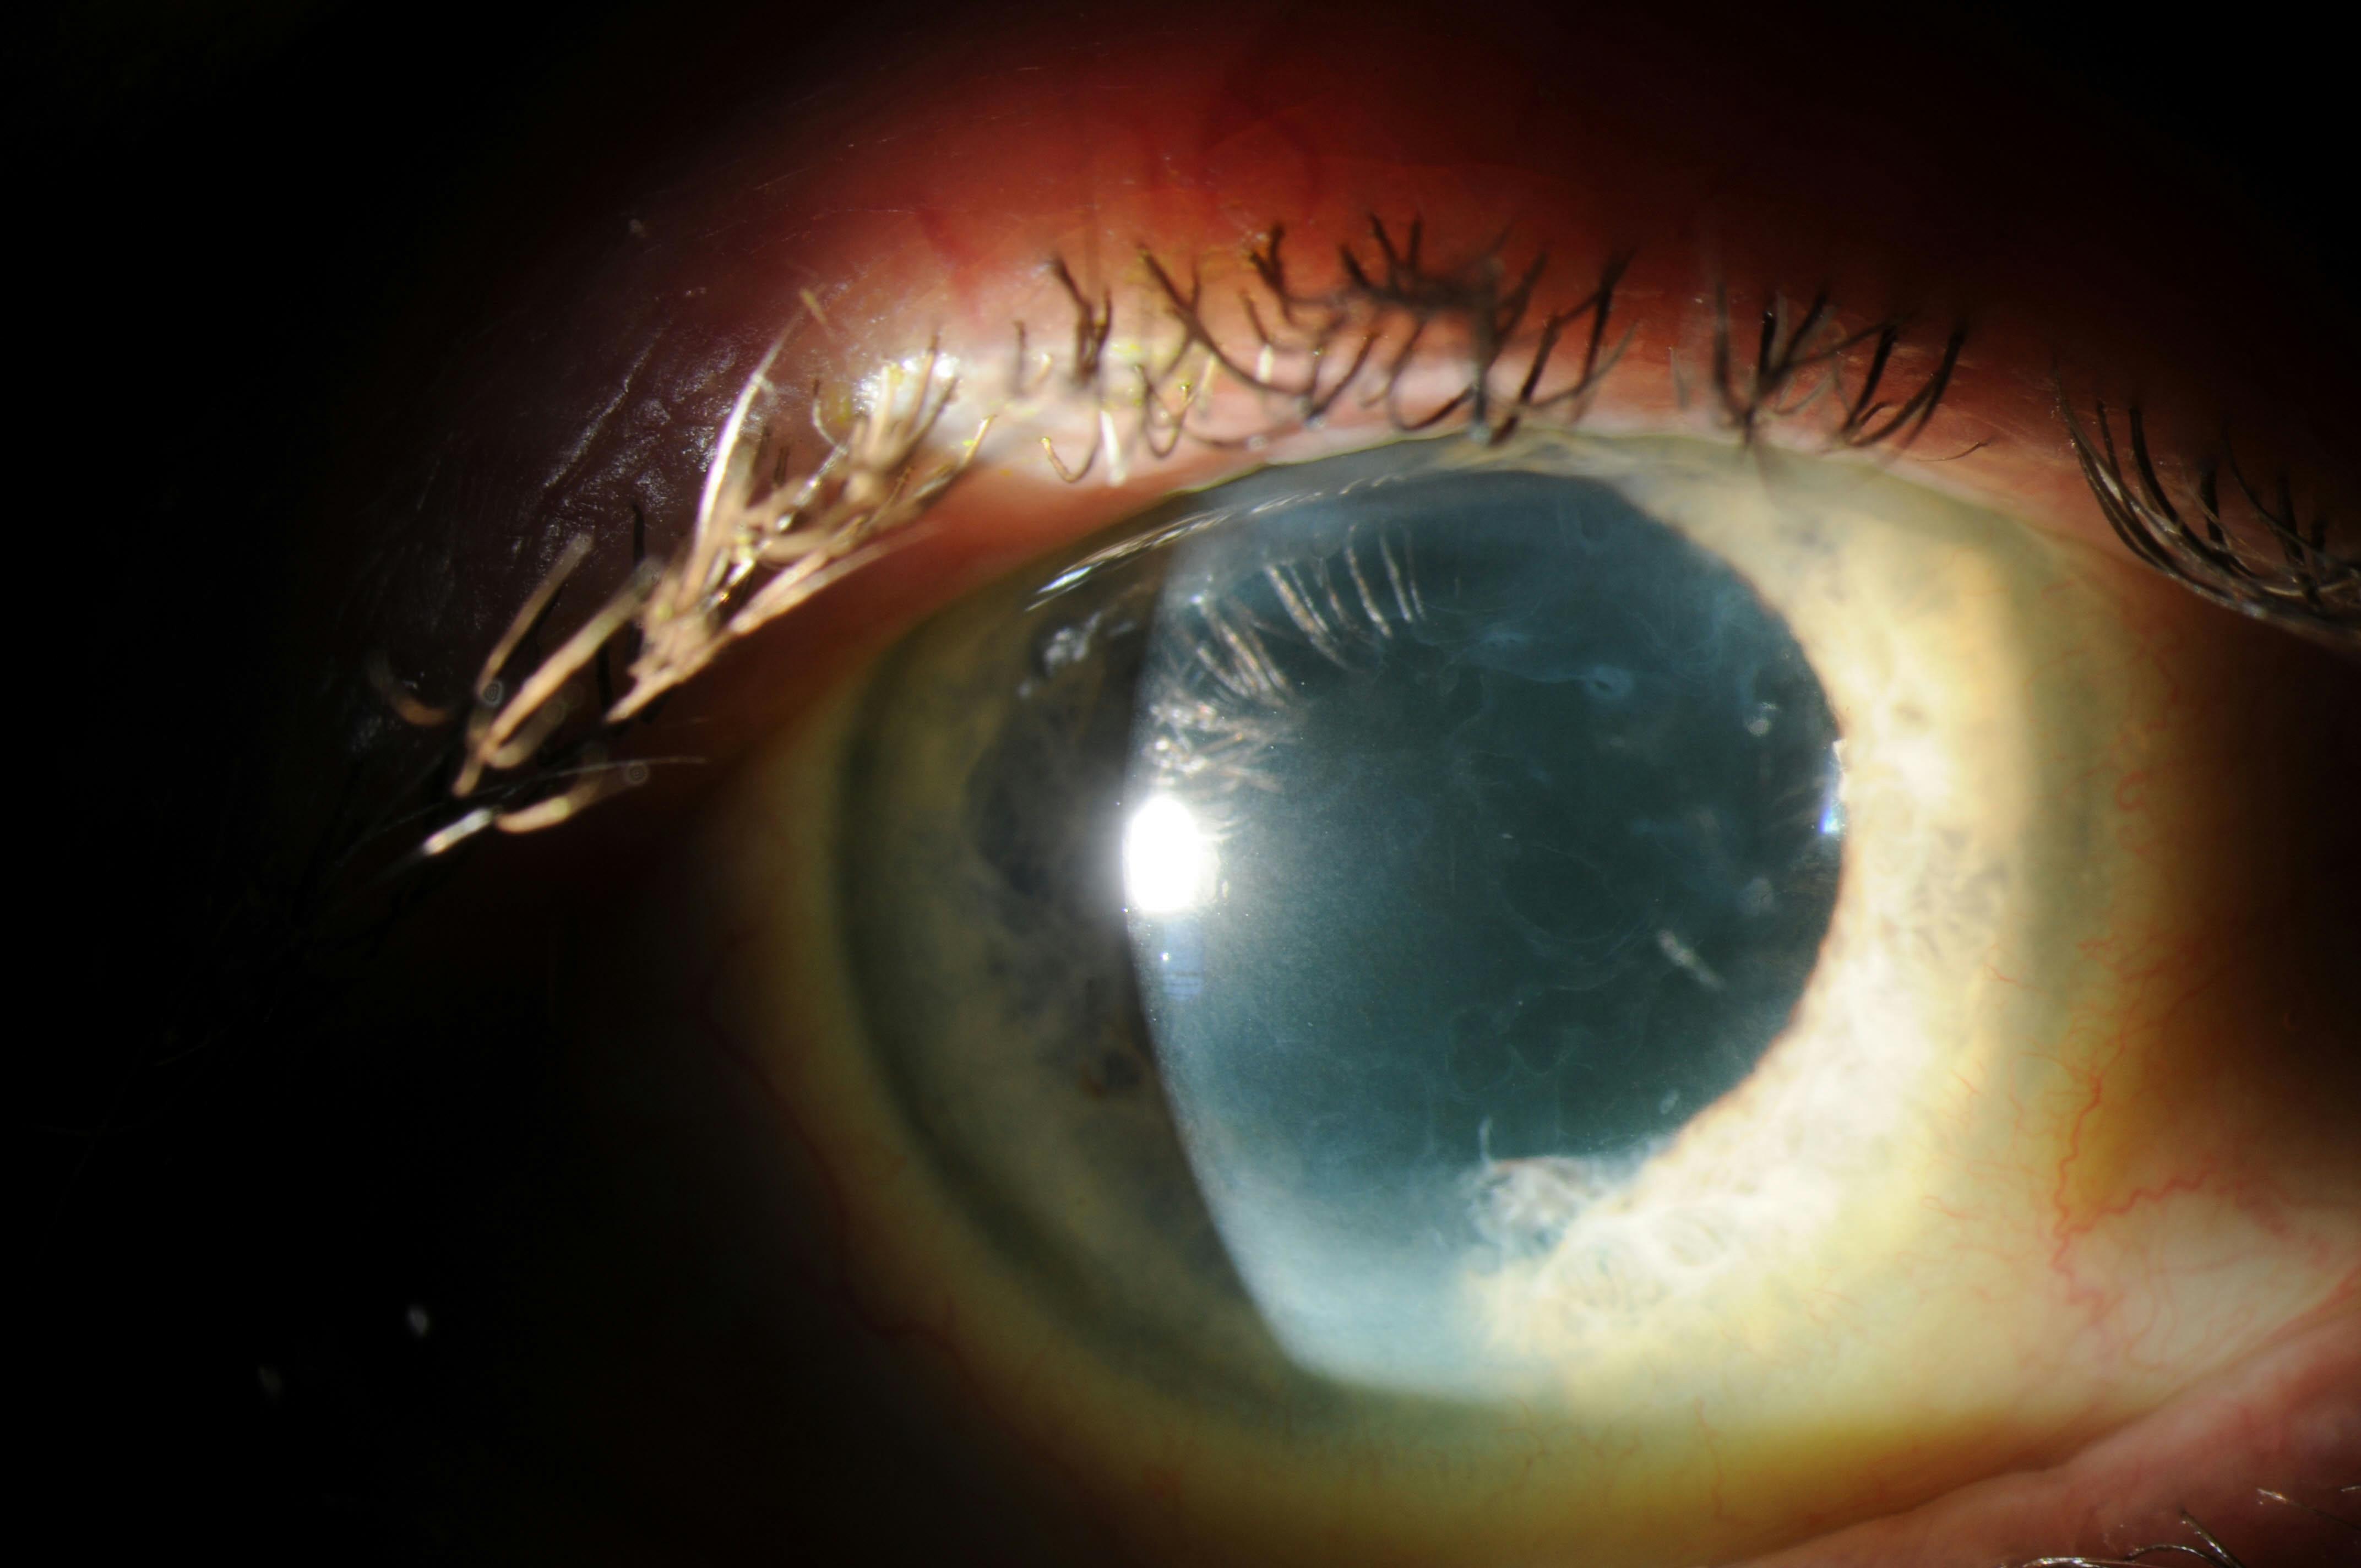 Moran CORE | Anterior Bat Membrane Dystrophy (ABMD) on macular corneal dystrophy, congenital stromal corneal dystrophy, map dot cornea, lattice corneal dystrophy type i, fleck corneal dystrophy, lisch epithelial corneal dystrophy, map dot syndrome, posterior polymorphous corneal dystrophy 2, granular corneal dystrophy type ii, map dot fingerprint treatment, map dot fingerprint disorder, map measles strains, posterior polymorphous corneal dystrophy 3, map dot atrophy, recurrent corneal erosion, map dot dysstrohy, corneal dystrophy of bowman layer, type ii, map dot fingerprint corneal epithelial, schnyder crystalline corneal dystrophy, posterior amorphous corneal dystrophy, x-linked endothelial corneal dystrophy, posterior polymorphous corneal dystrophy 1, congenital endothelial dystrophy type 2, subepithelial mucinous corneal dystrophy, gelatinous drop-like corneal dystrophy,